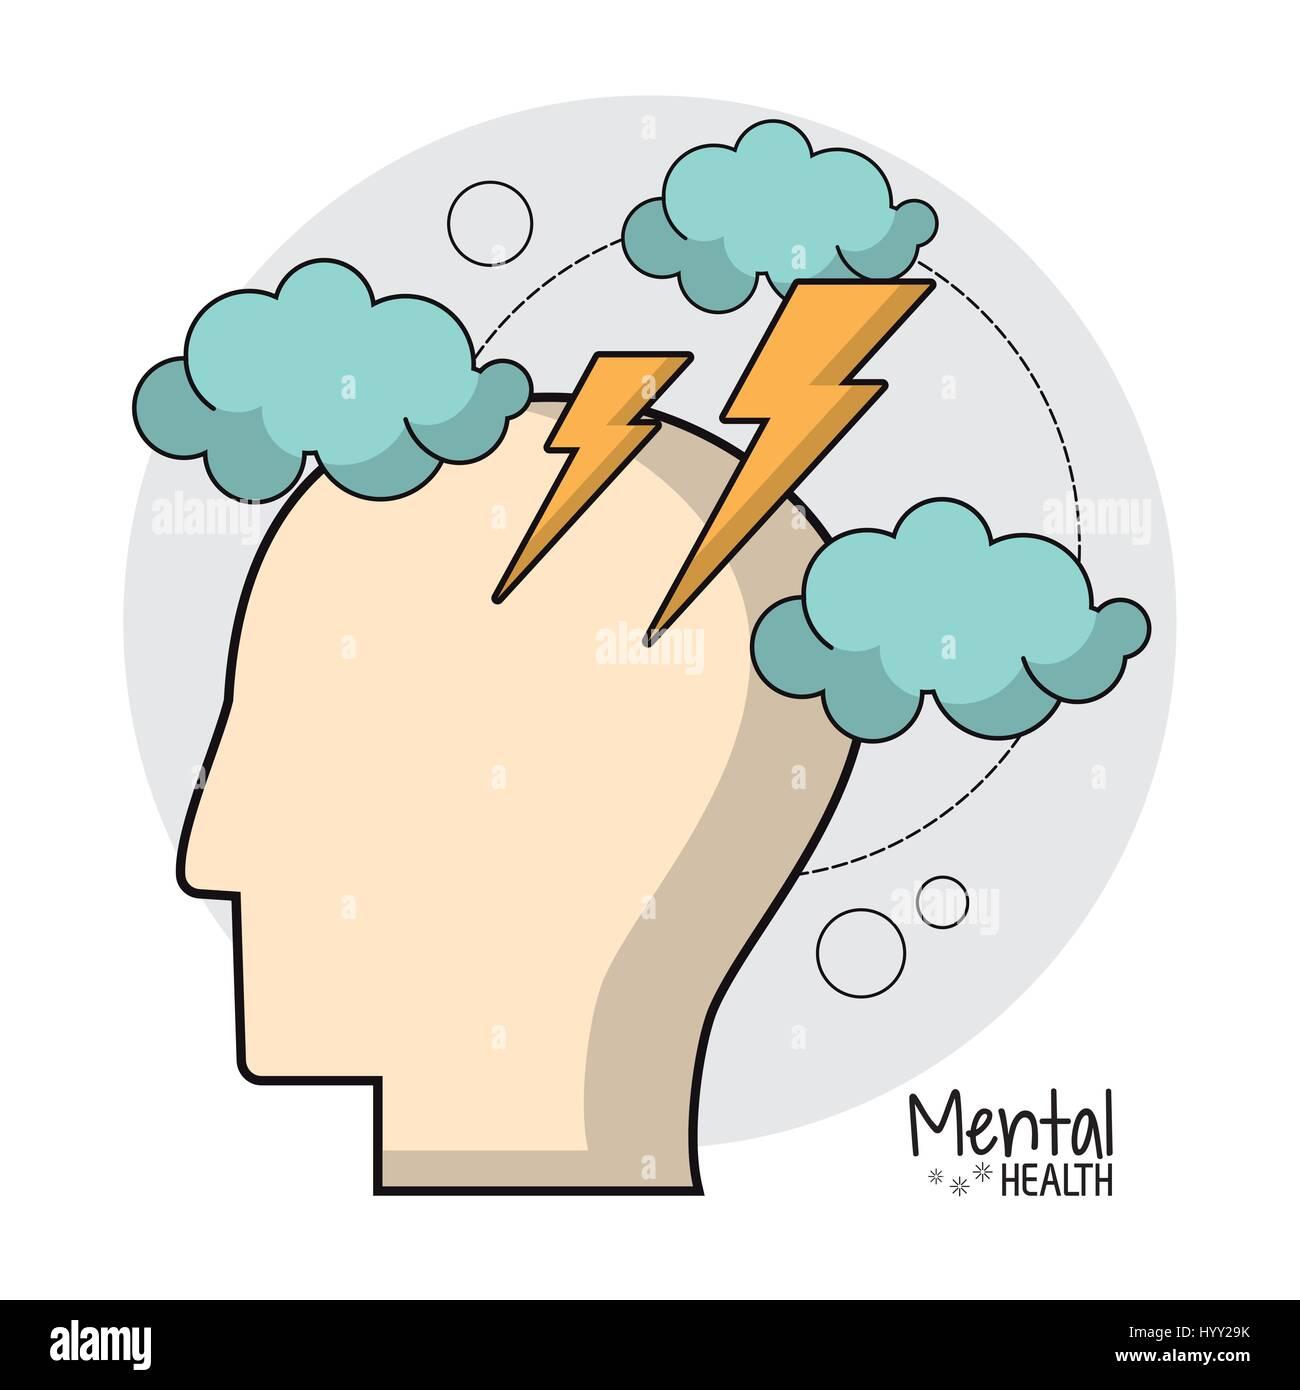 La salute mentale brain storm idee Immagini Stock